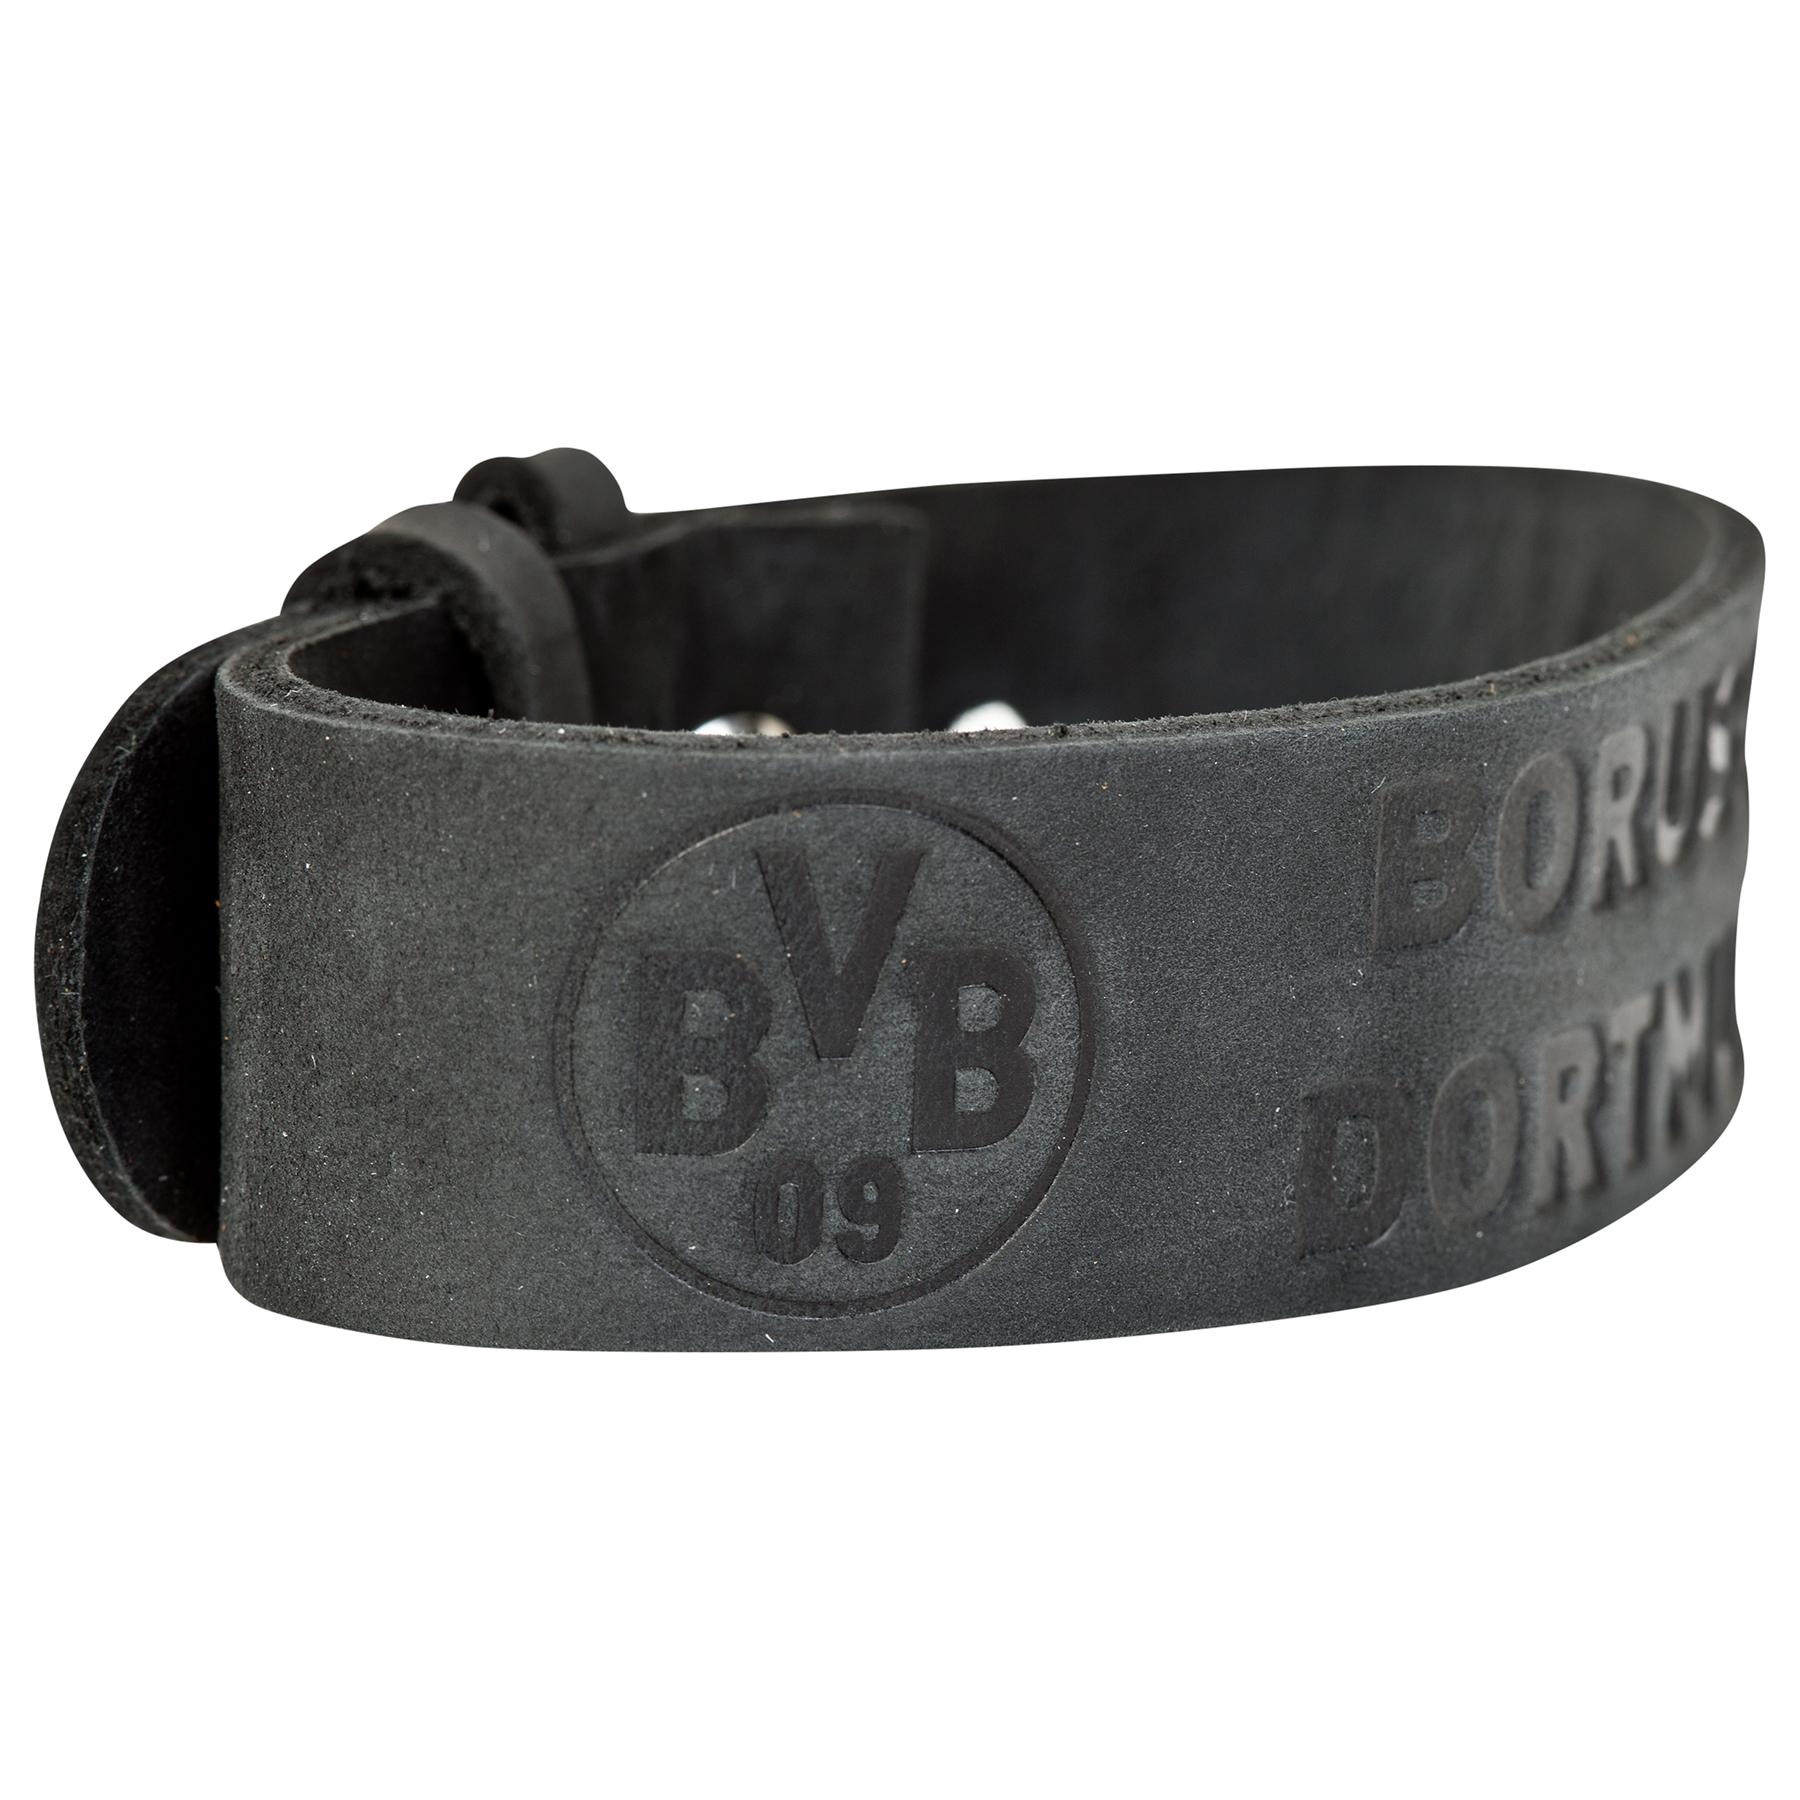 BVB Black Leather Bracelet, Blue